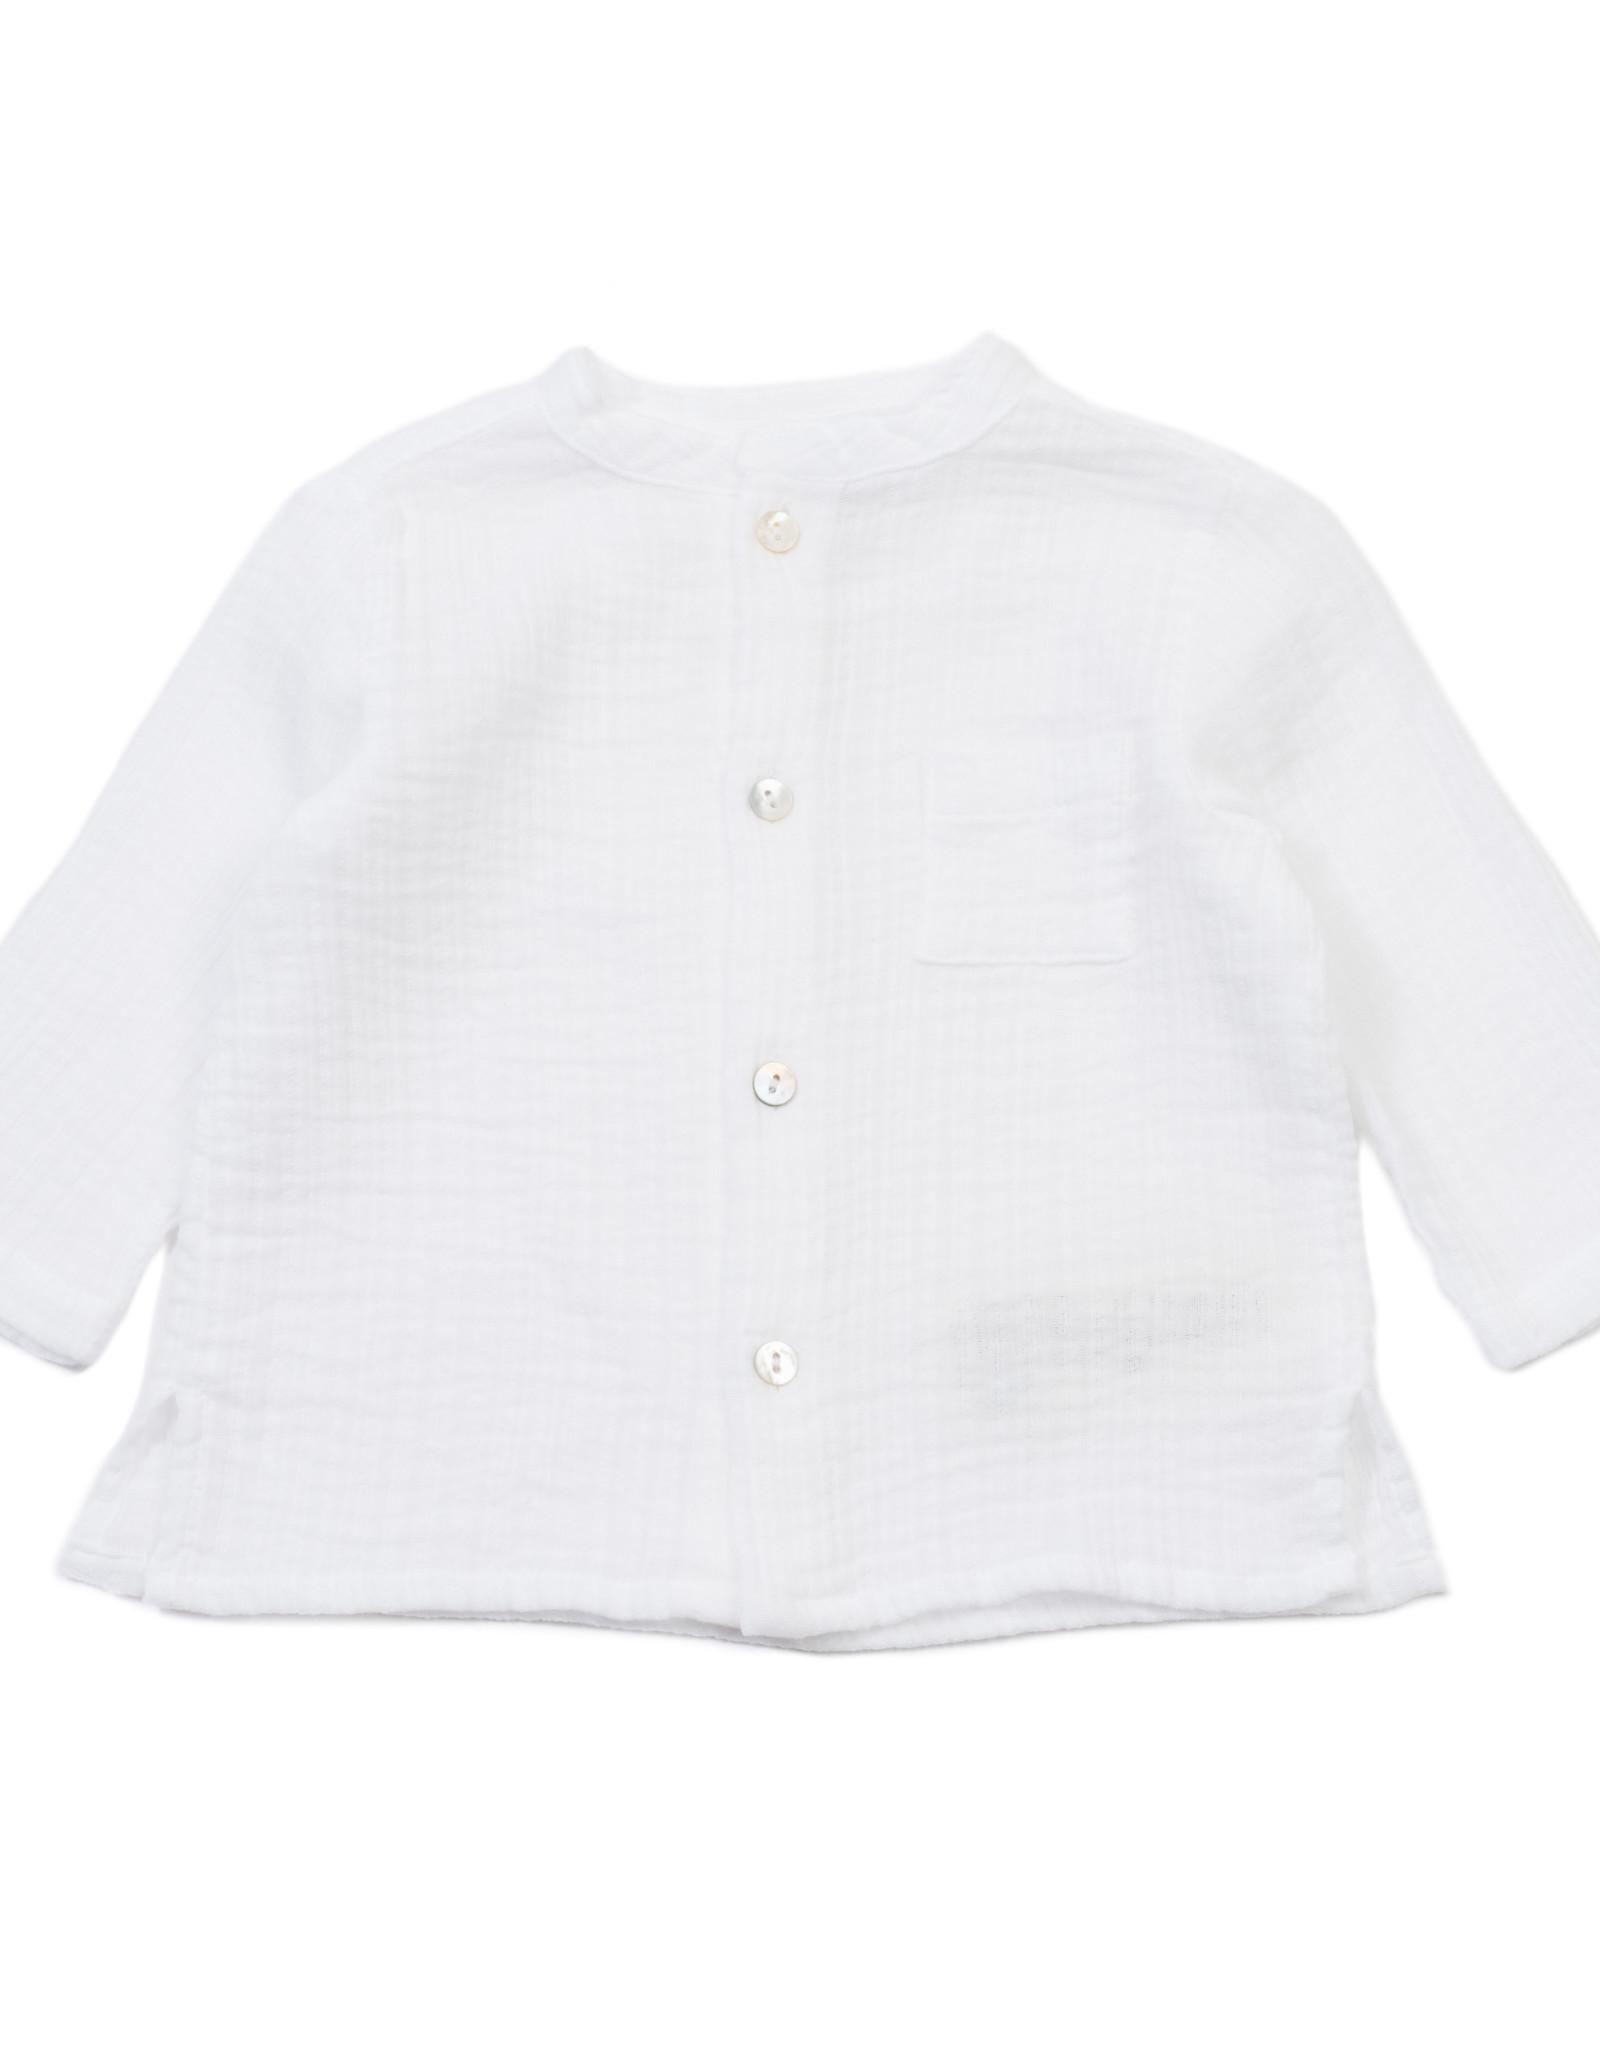 Bonton Baby Inter tunic